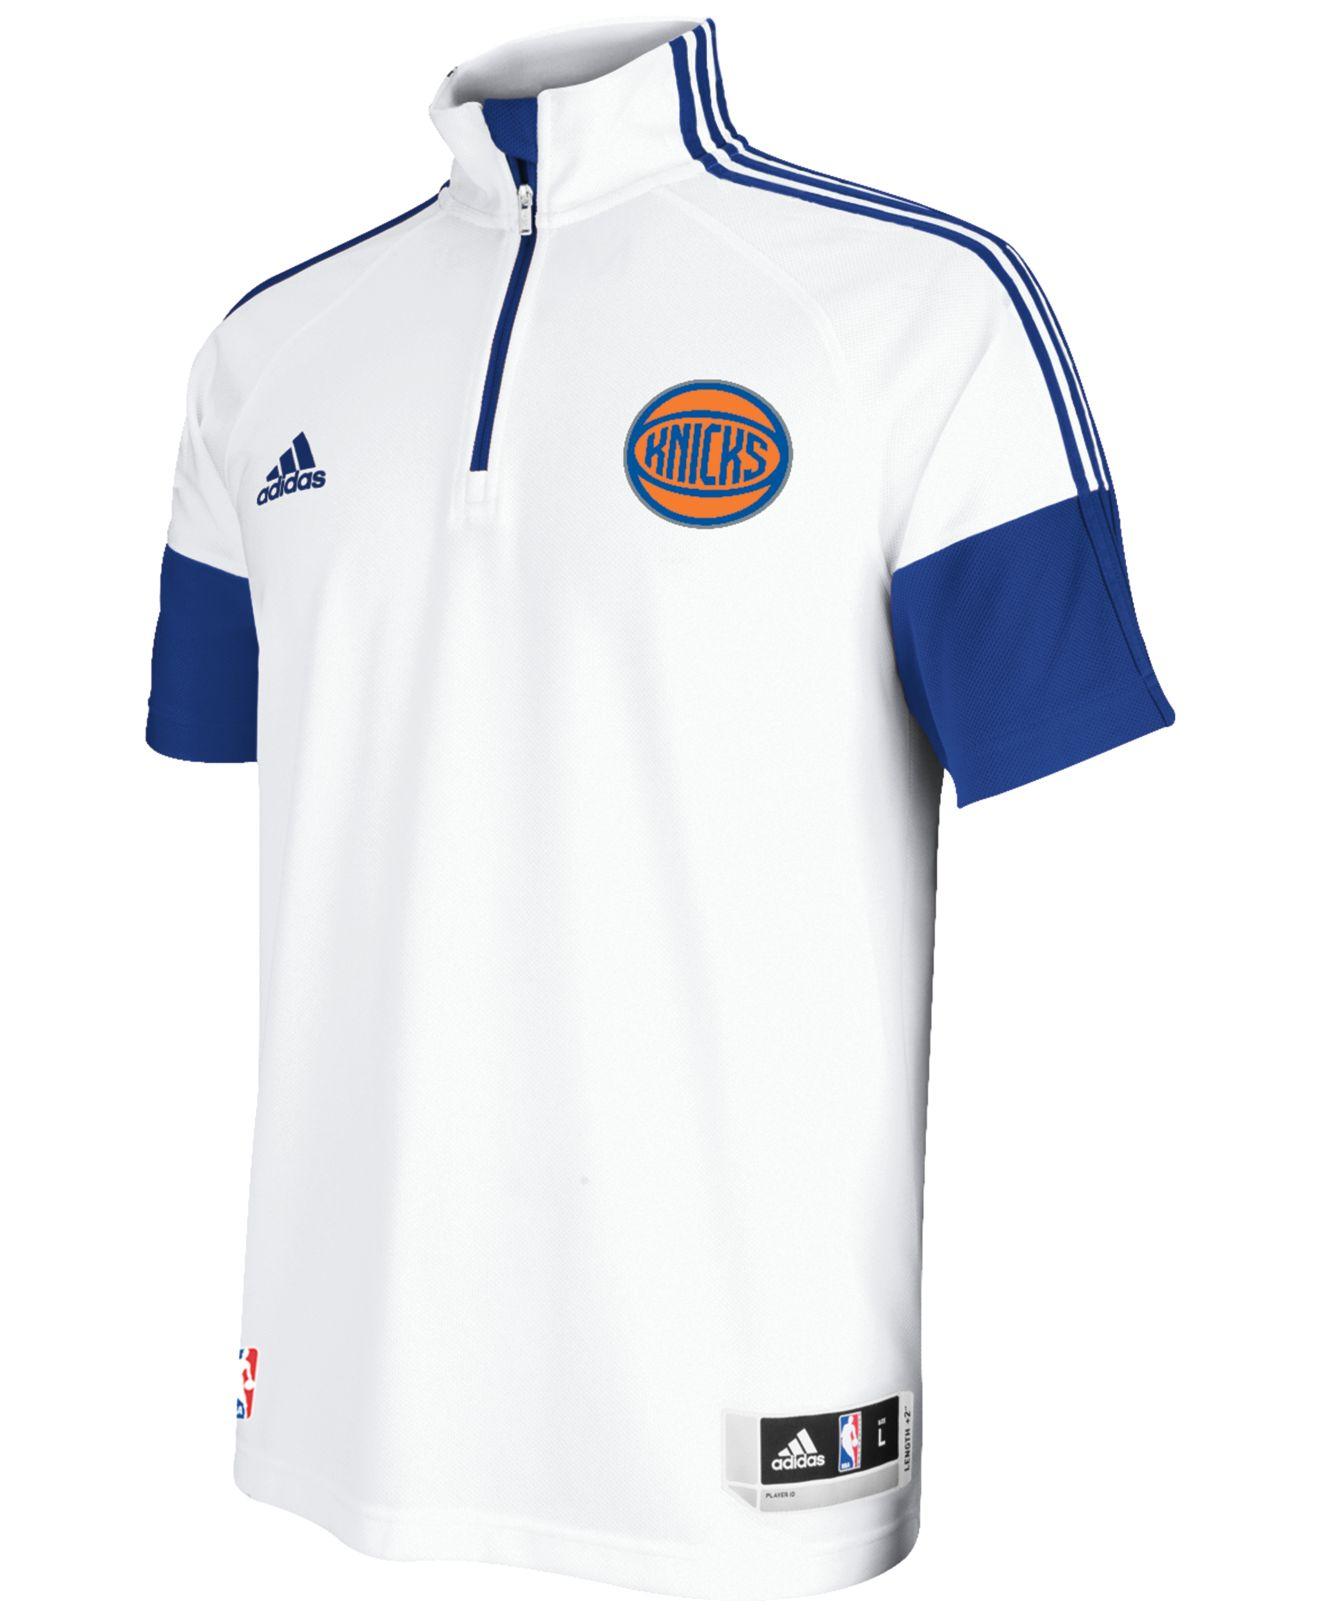 471cb4e75 Lyst - adidas Men s New York Knicks Game Time Shooting Shirt in ...